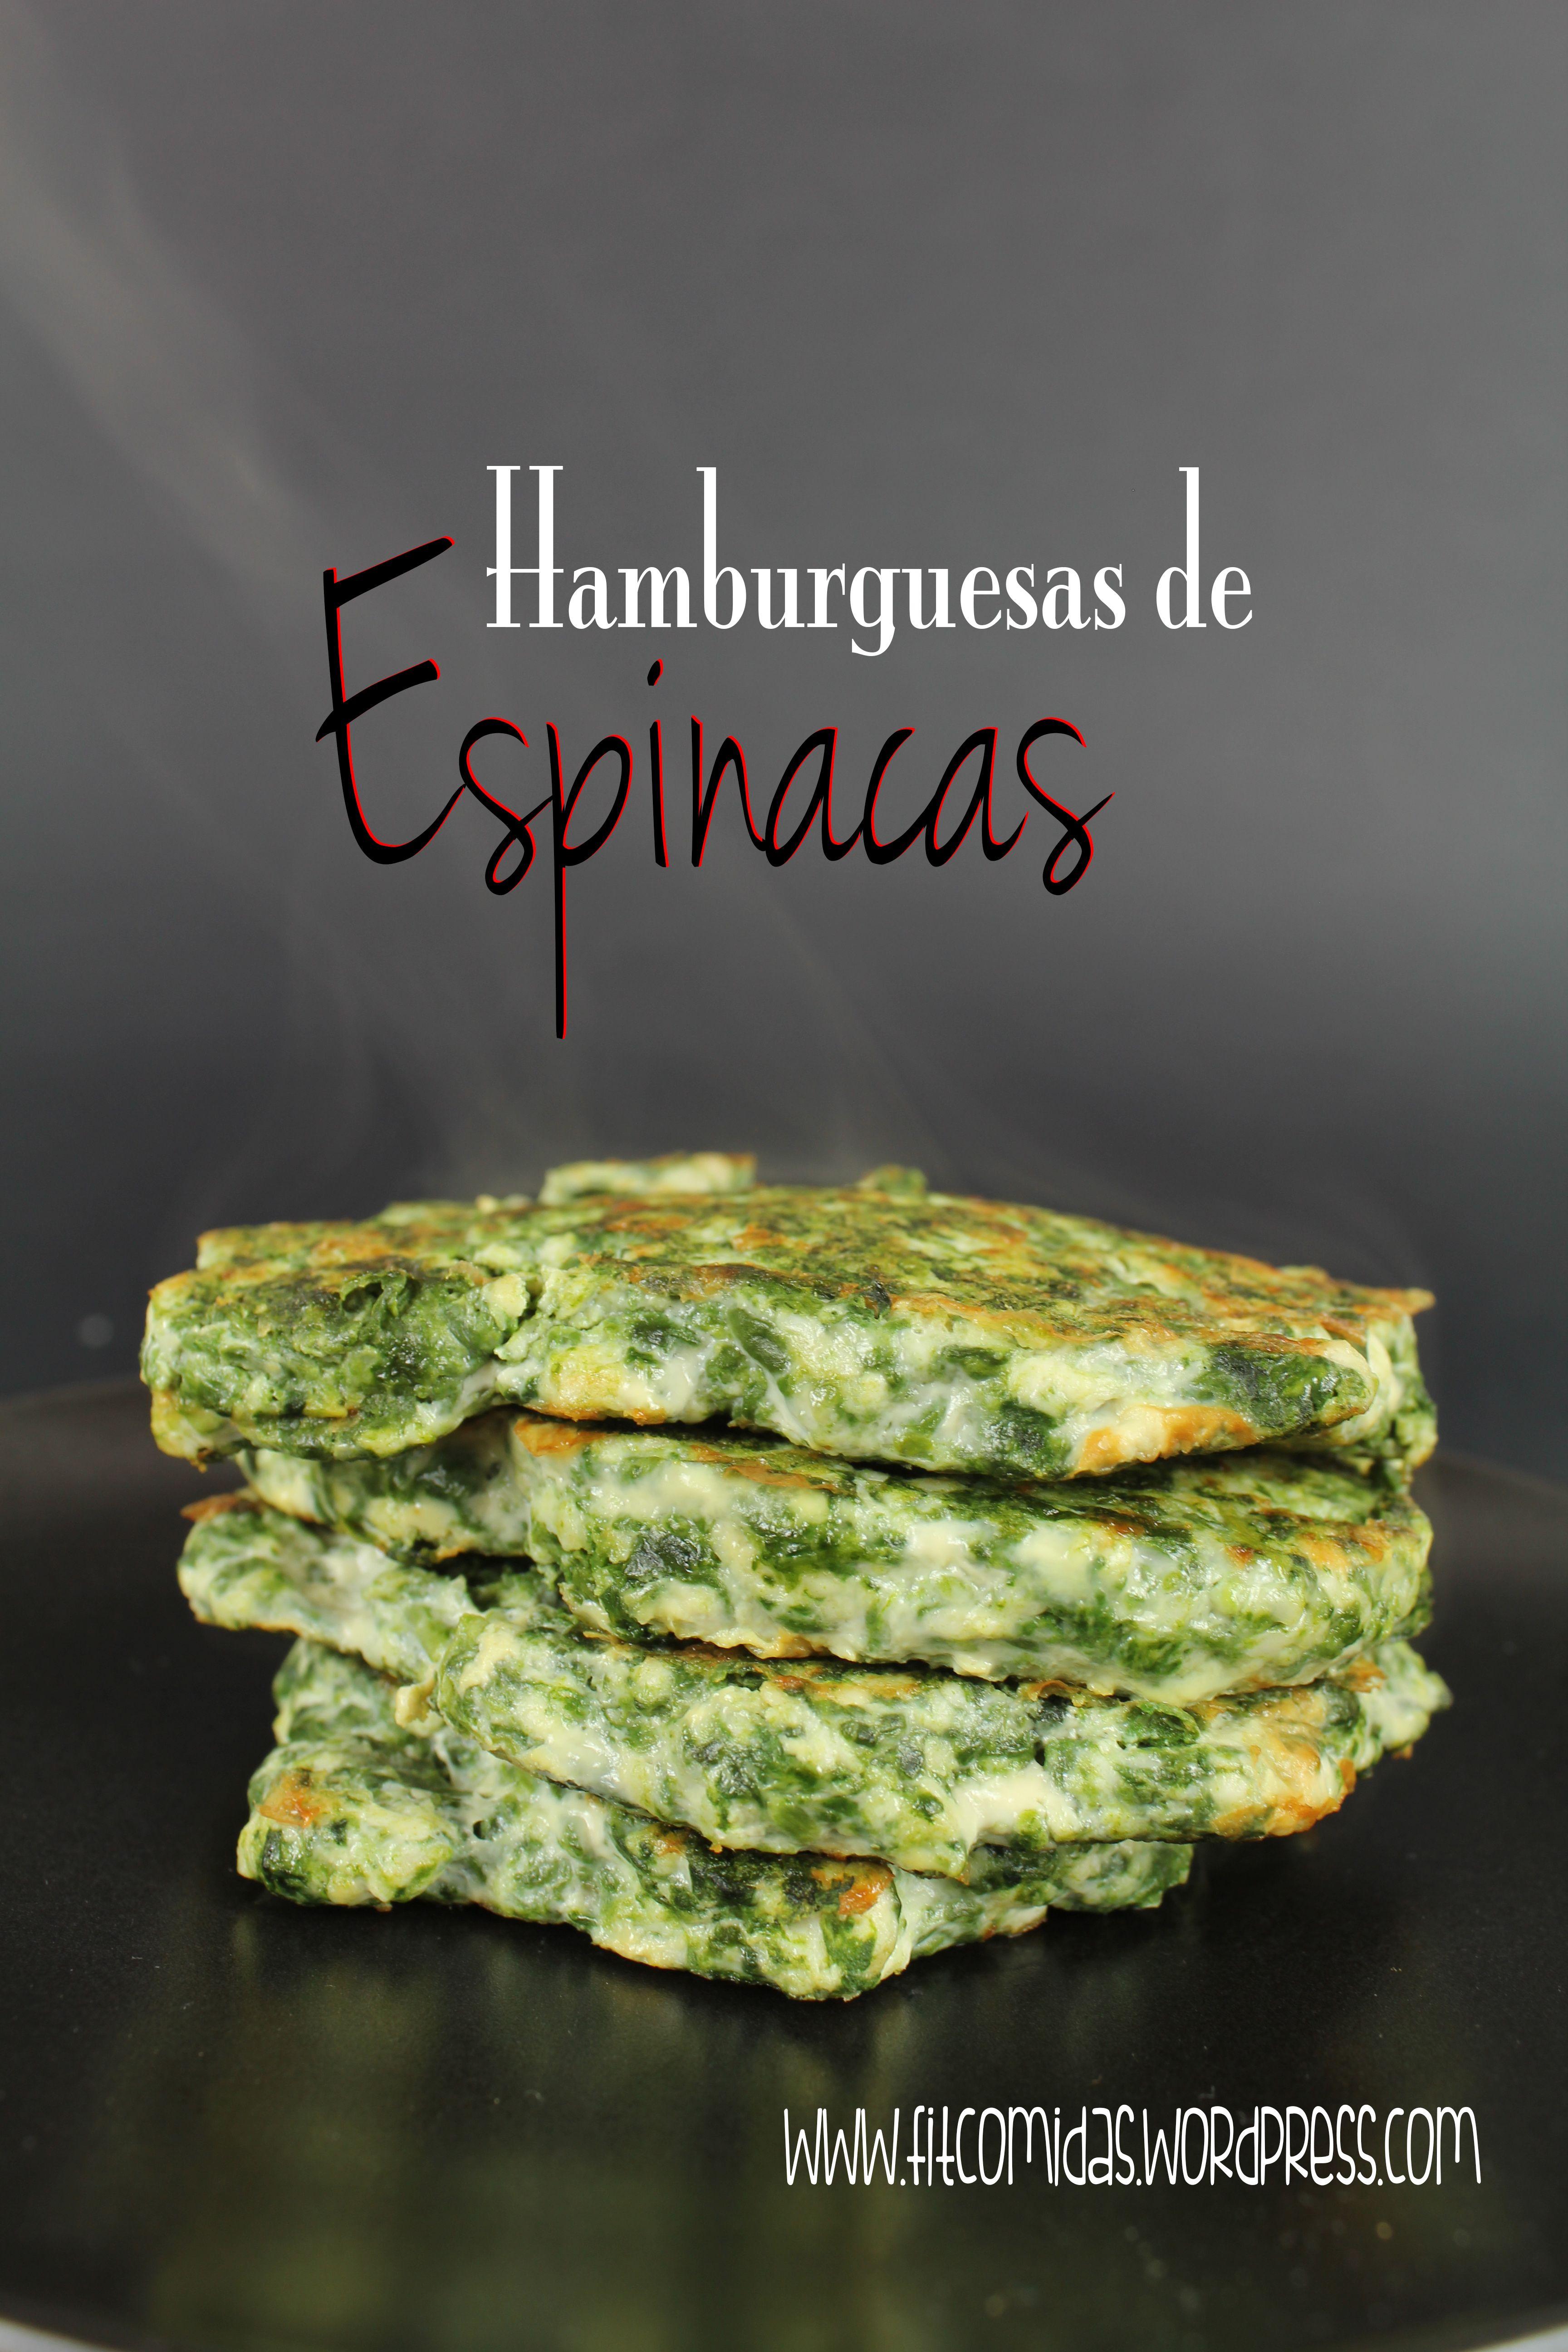 Hamburguesas de espinacas  Adelgazar  Dieta sana